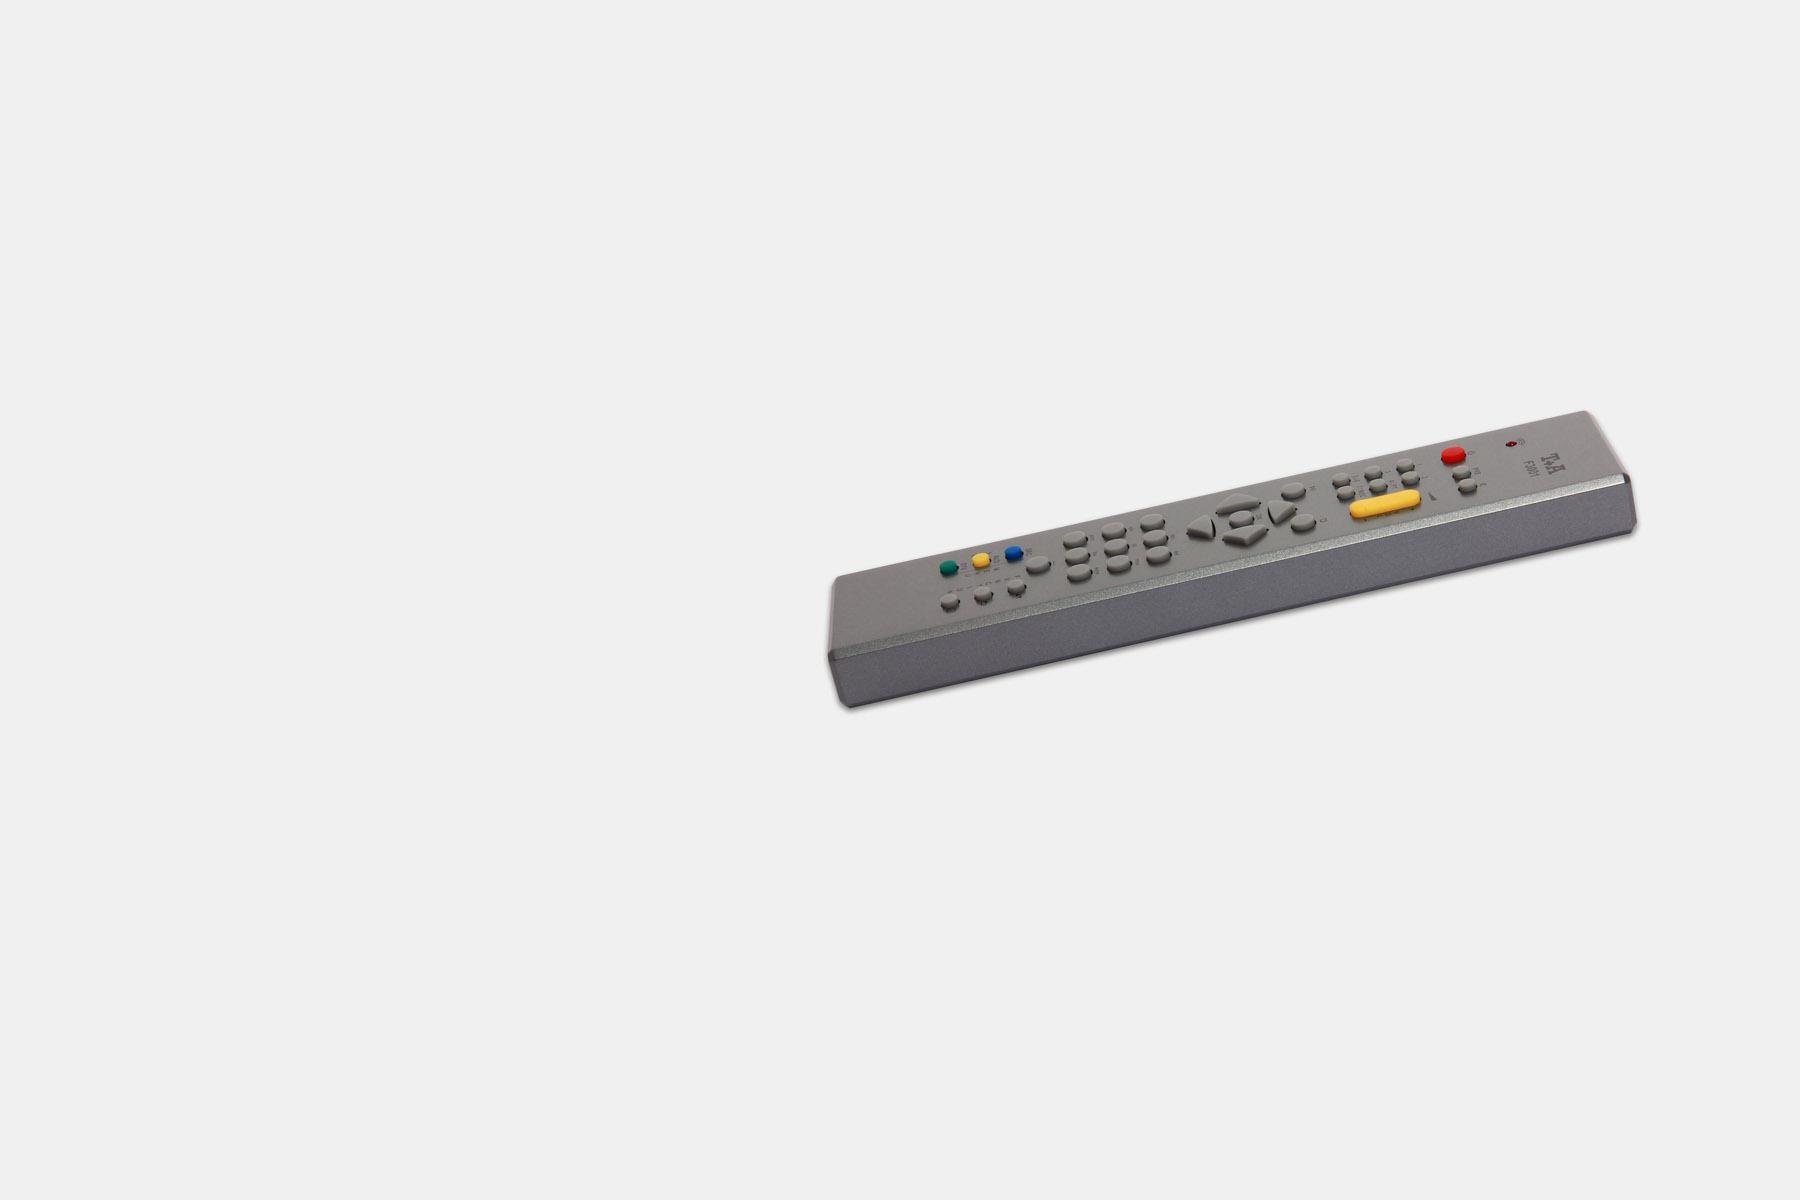 F3001 Ir Remote Control